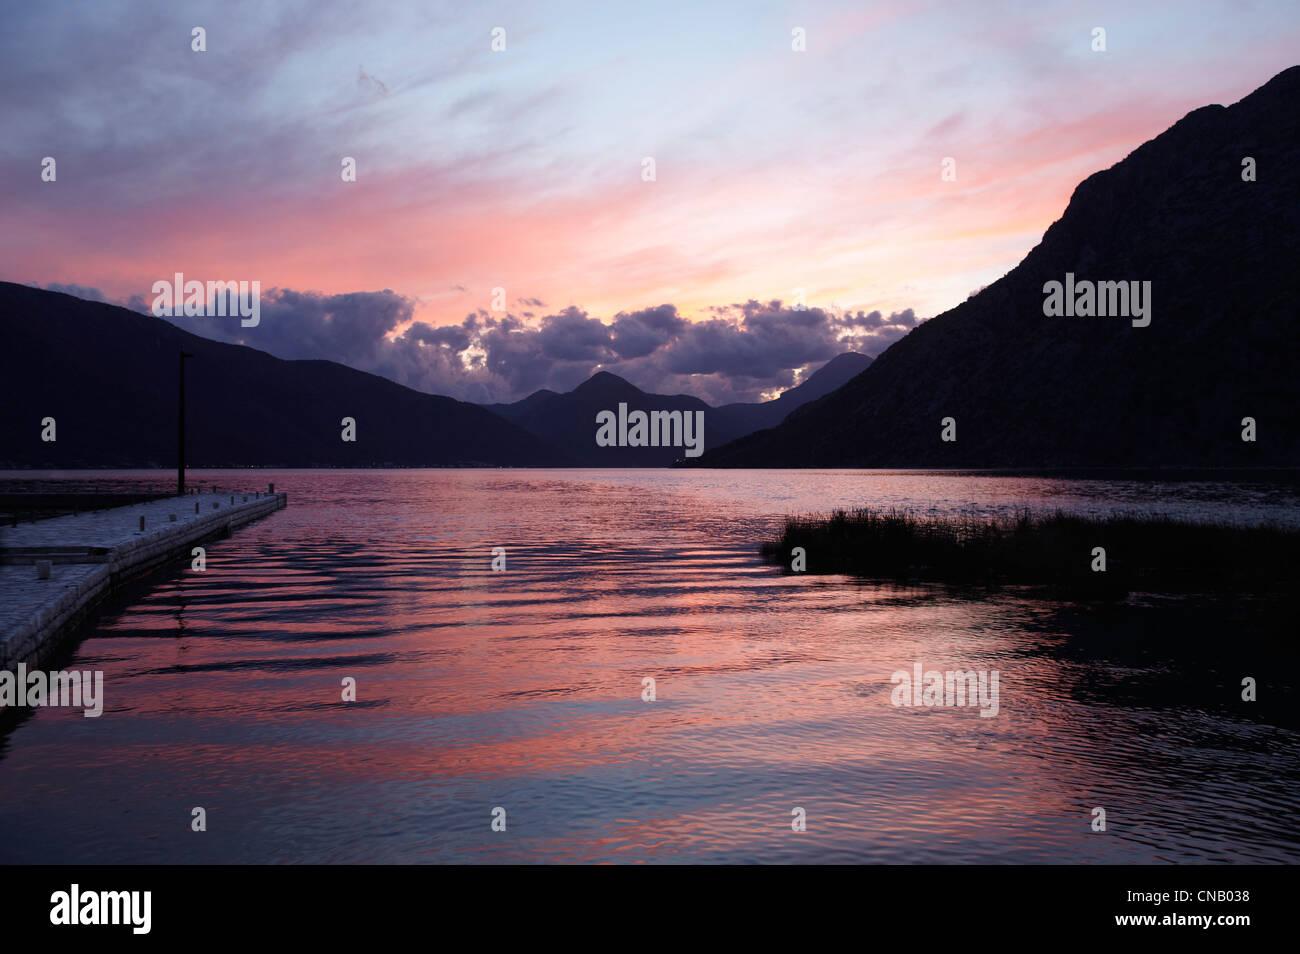 Sunset sky reflected in still lake - Stock Image